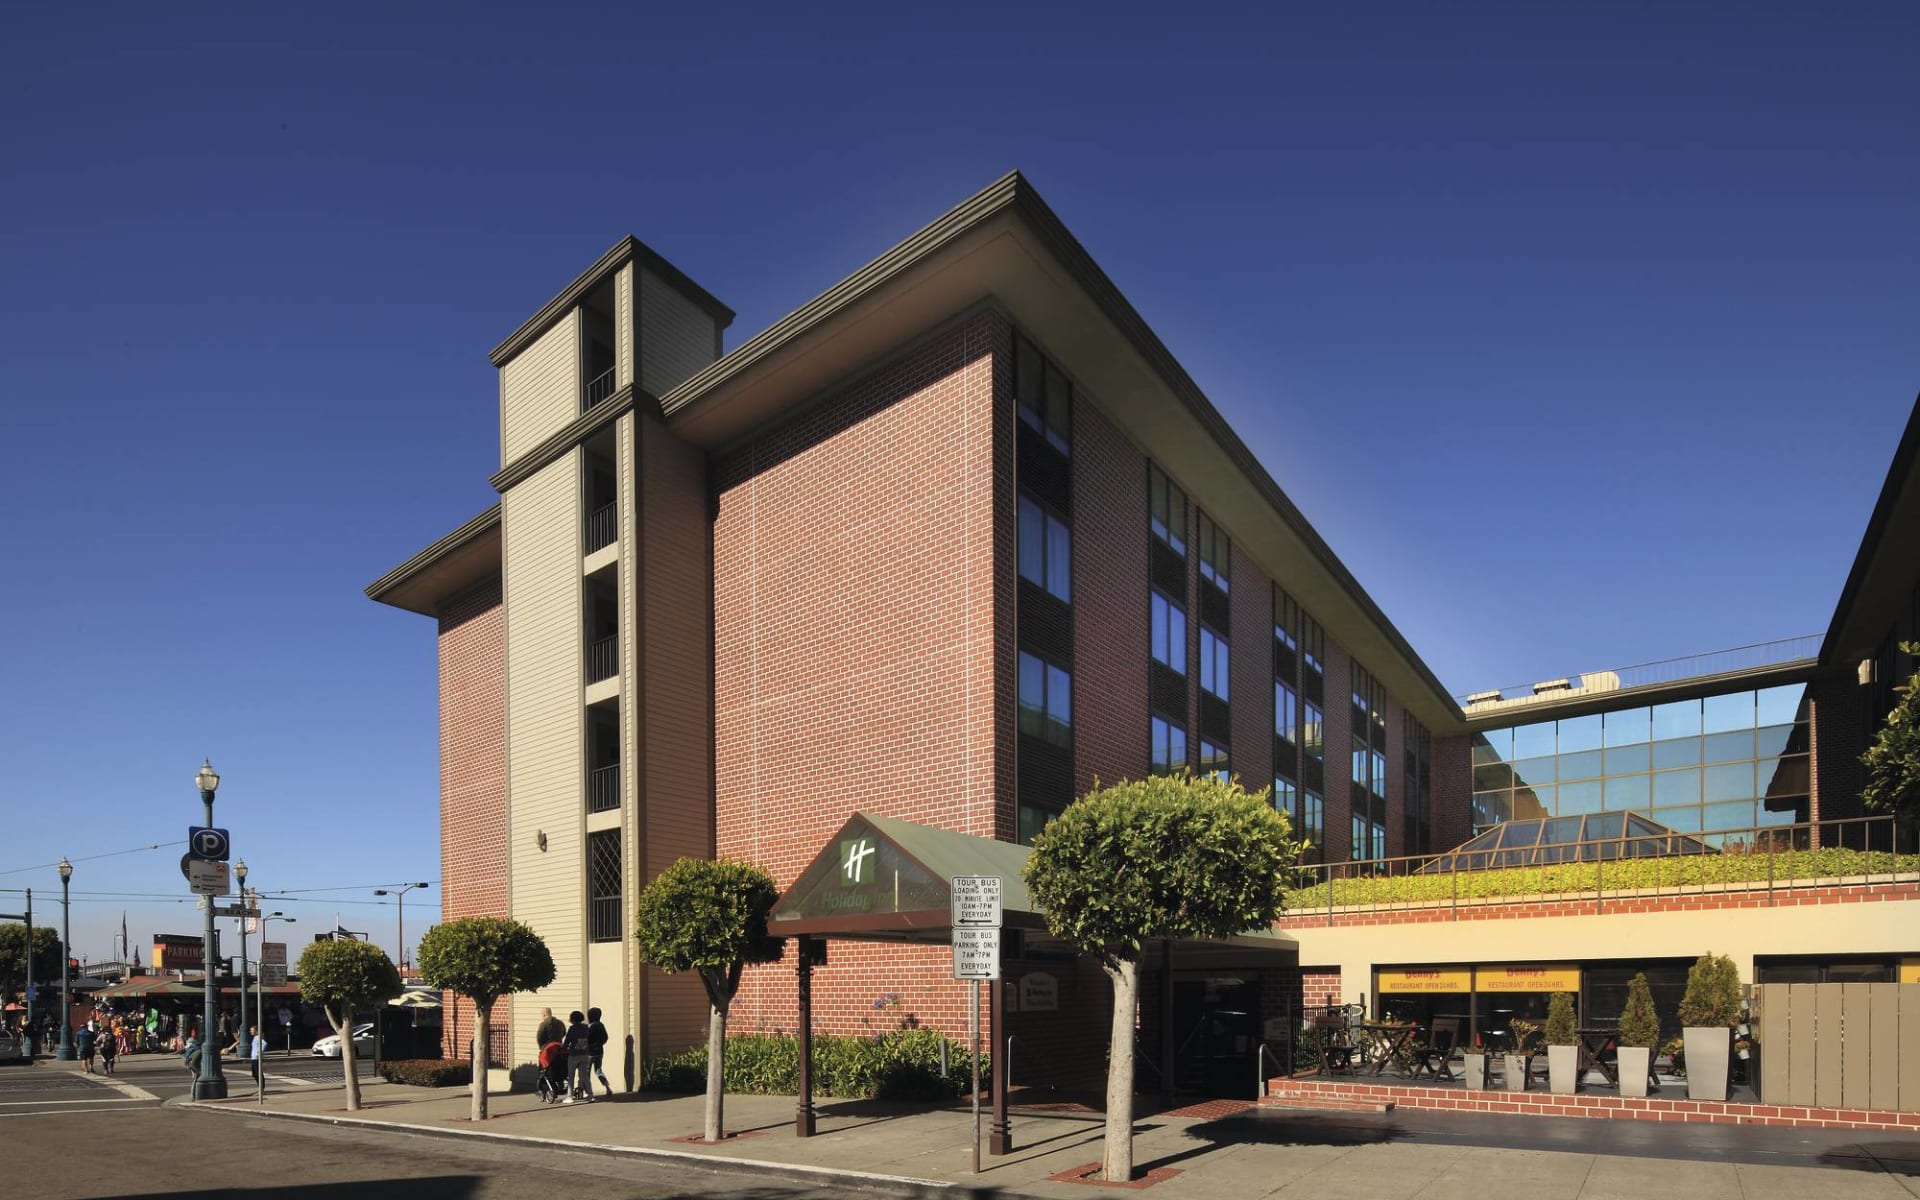 Holiday Inn Fisherman's Wharf in San Francisco: Exterior_Holiday Inn Fishermans Wharf_Hi_IHG_oct19